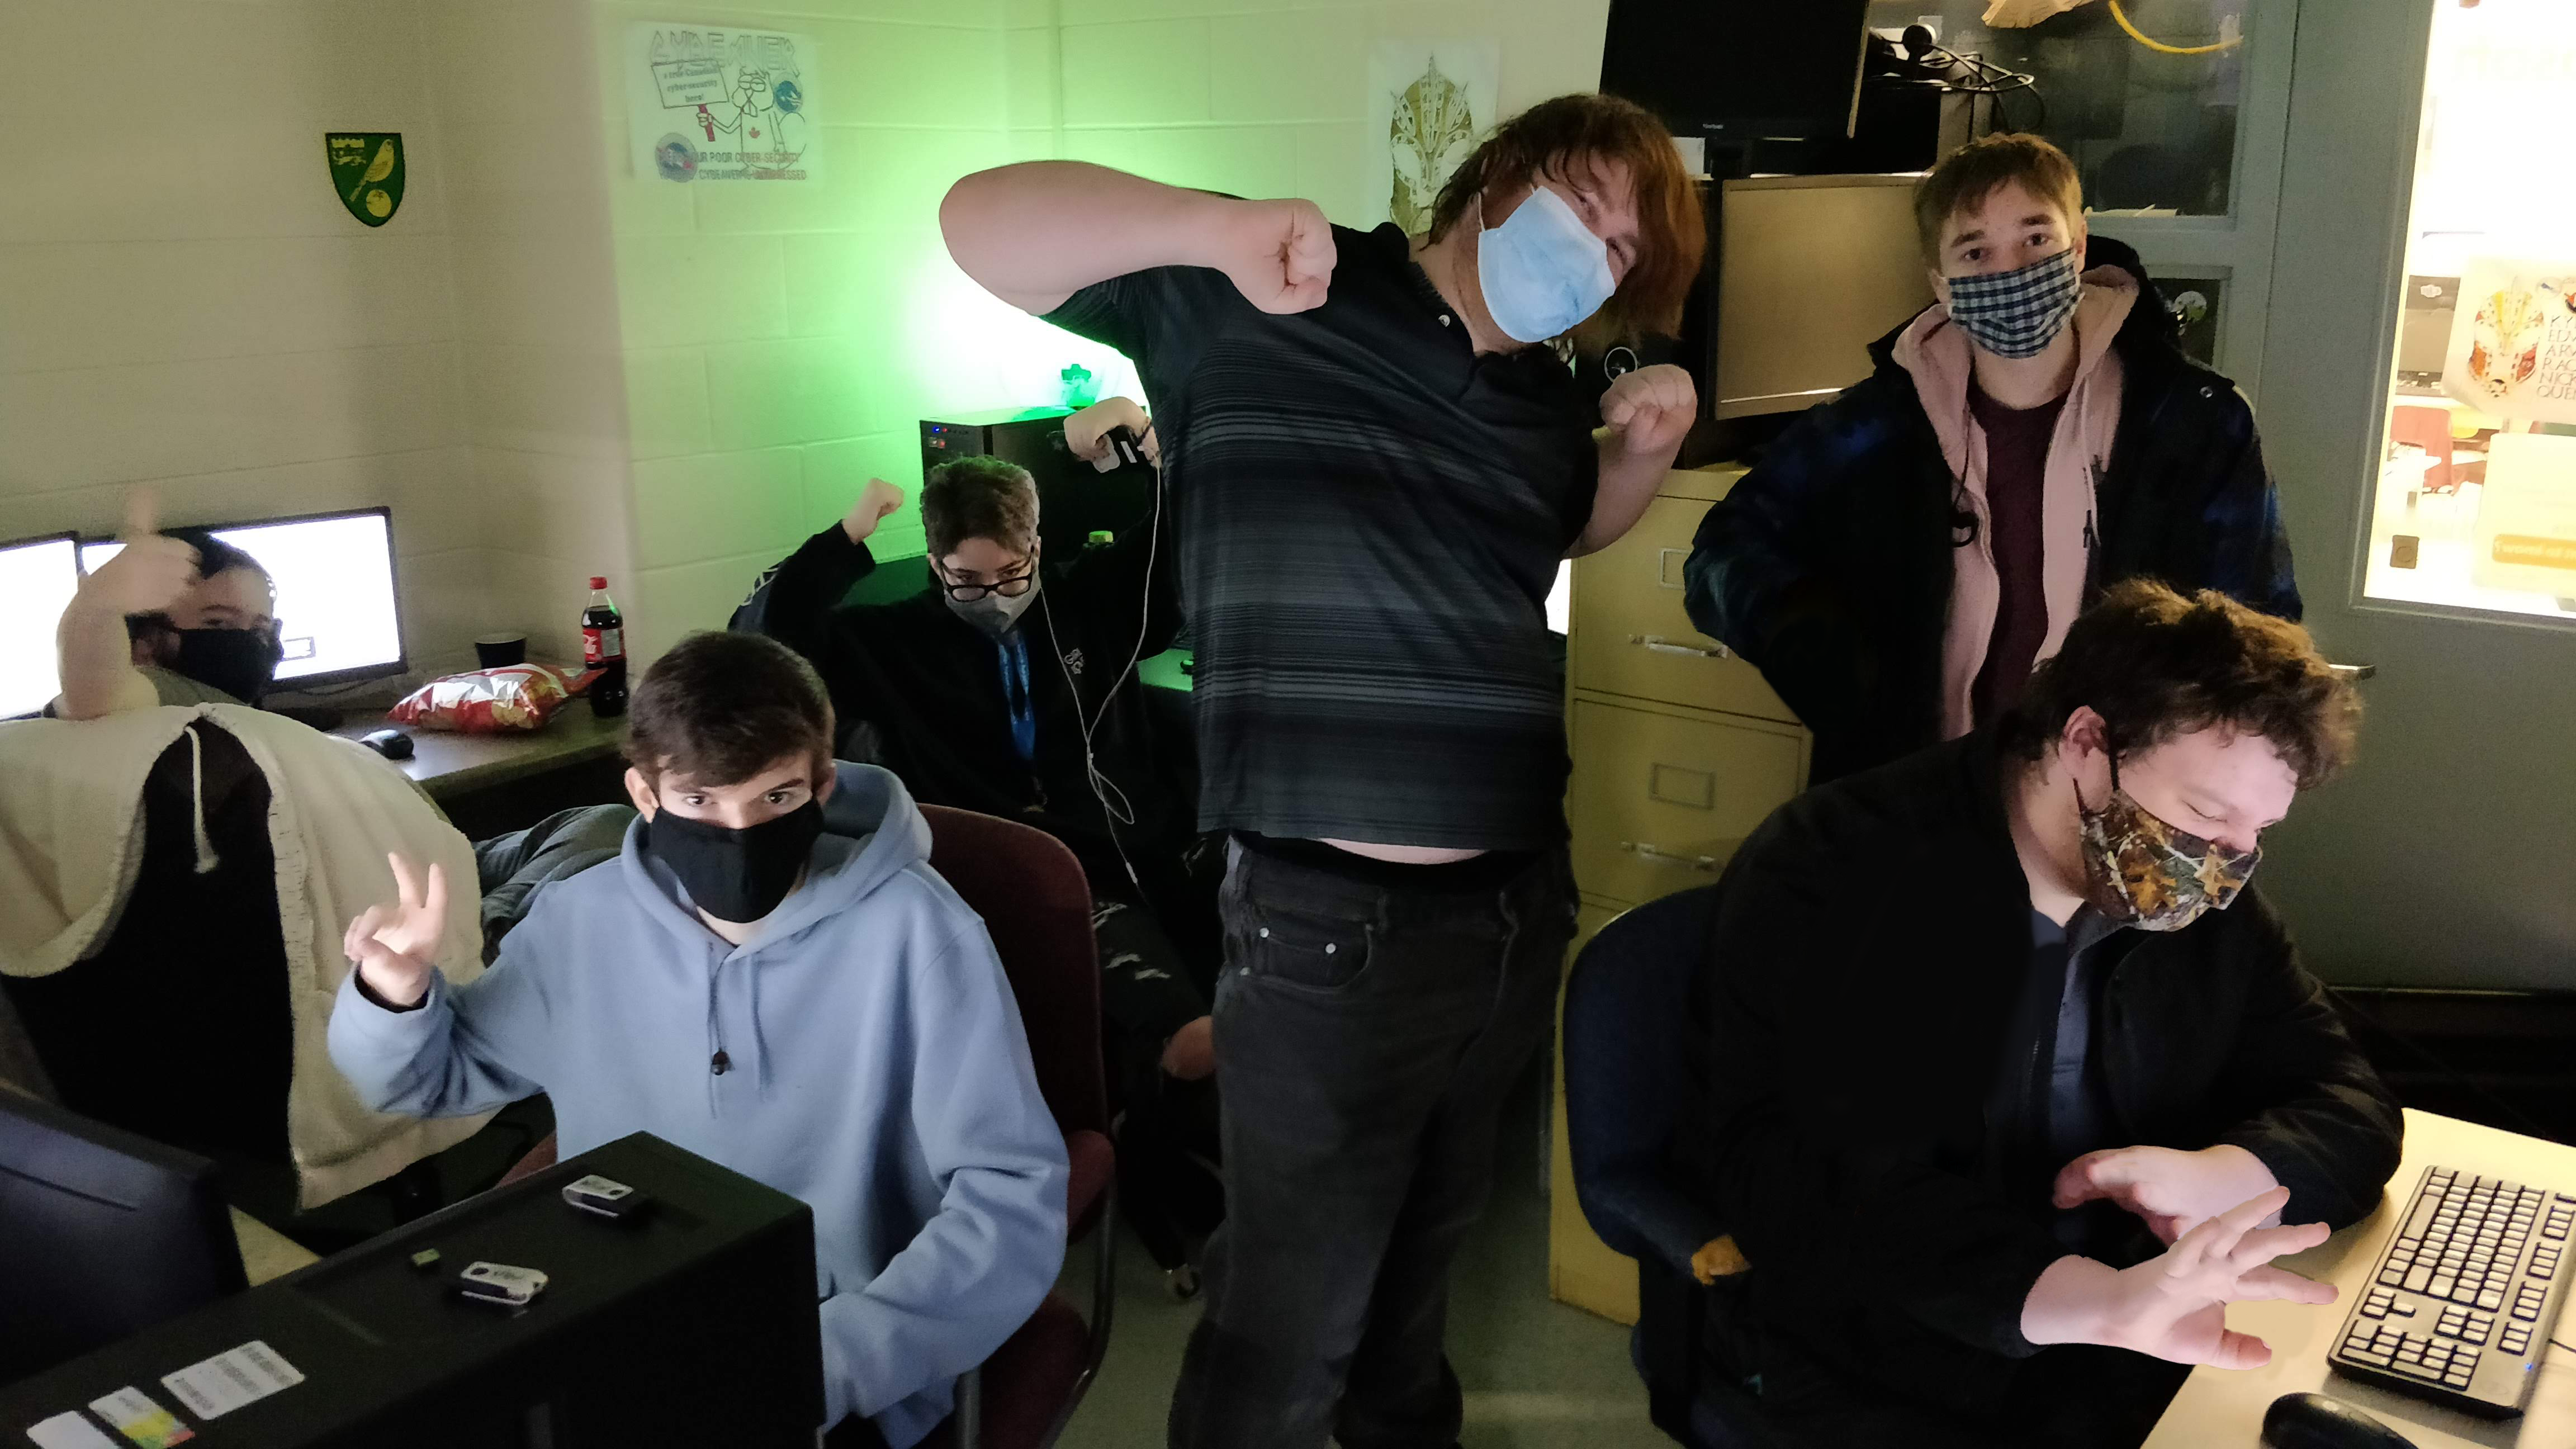 Meet the CyberTitans: Team FalconTech Plagueware